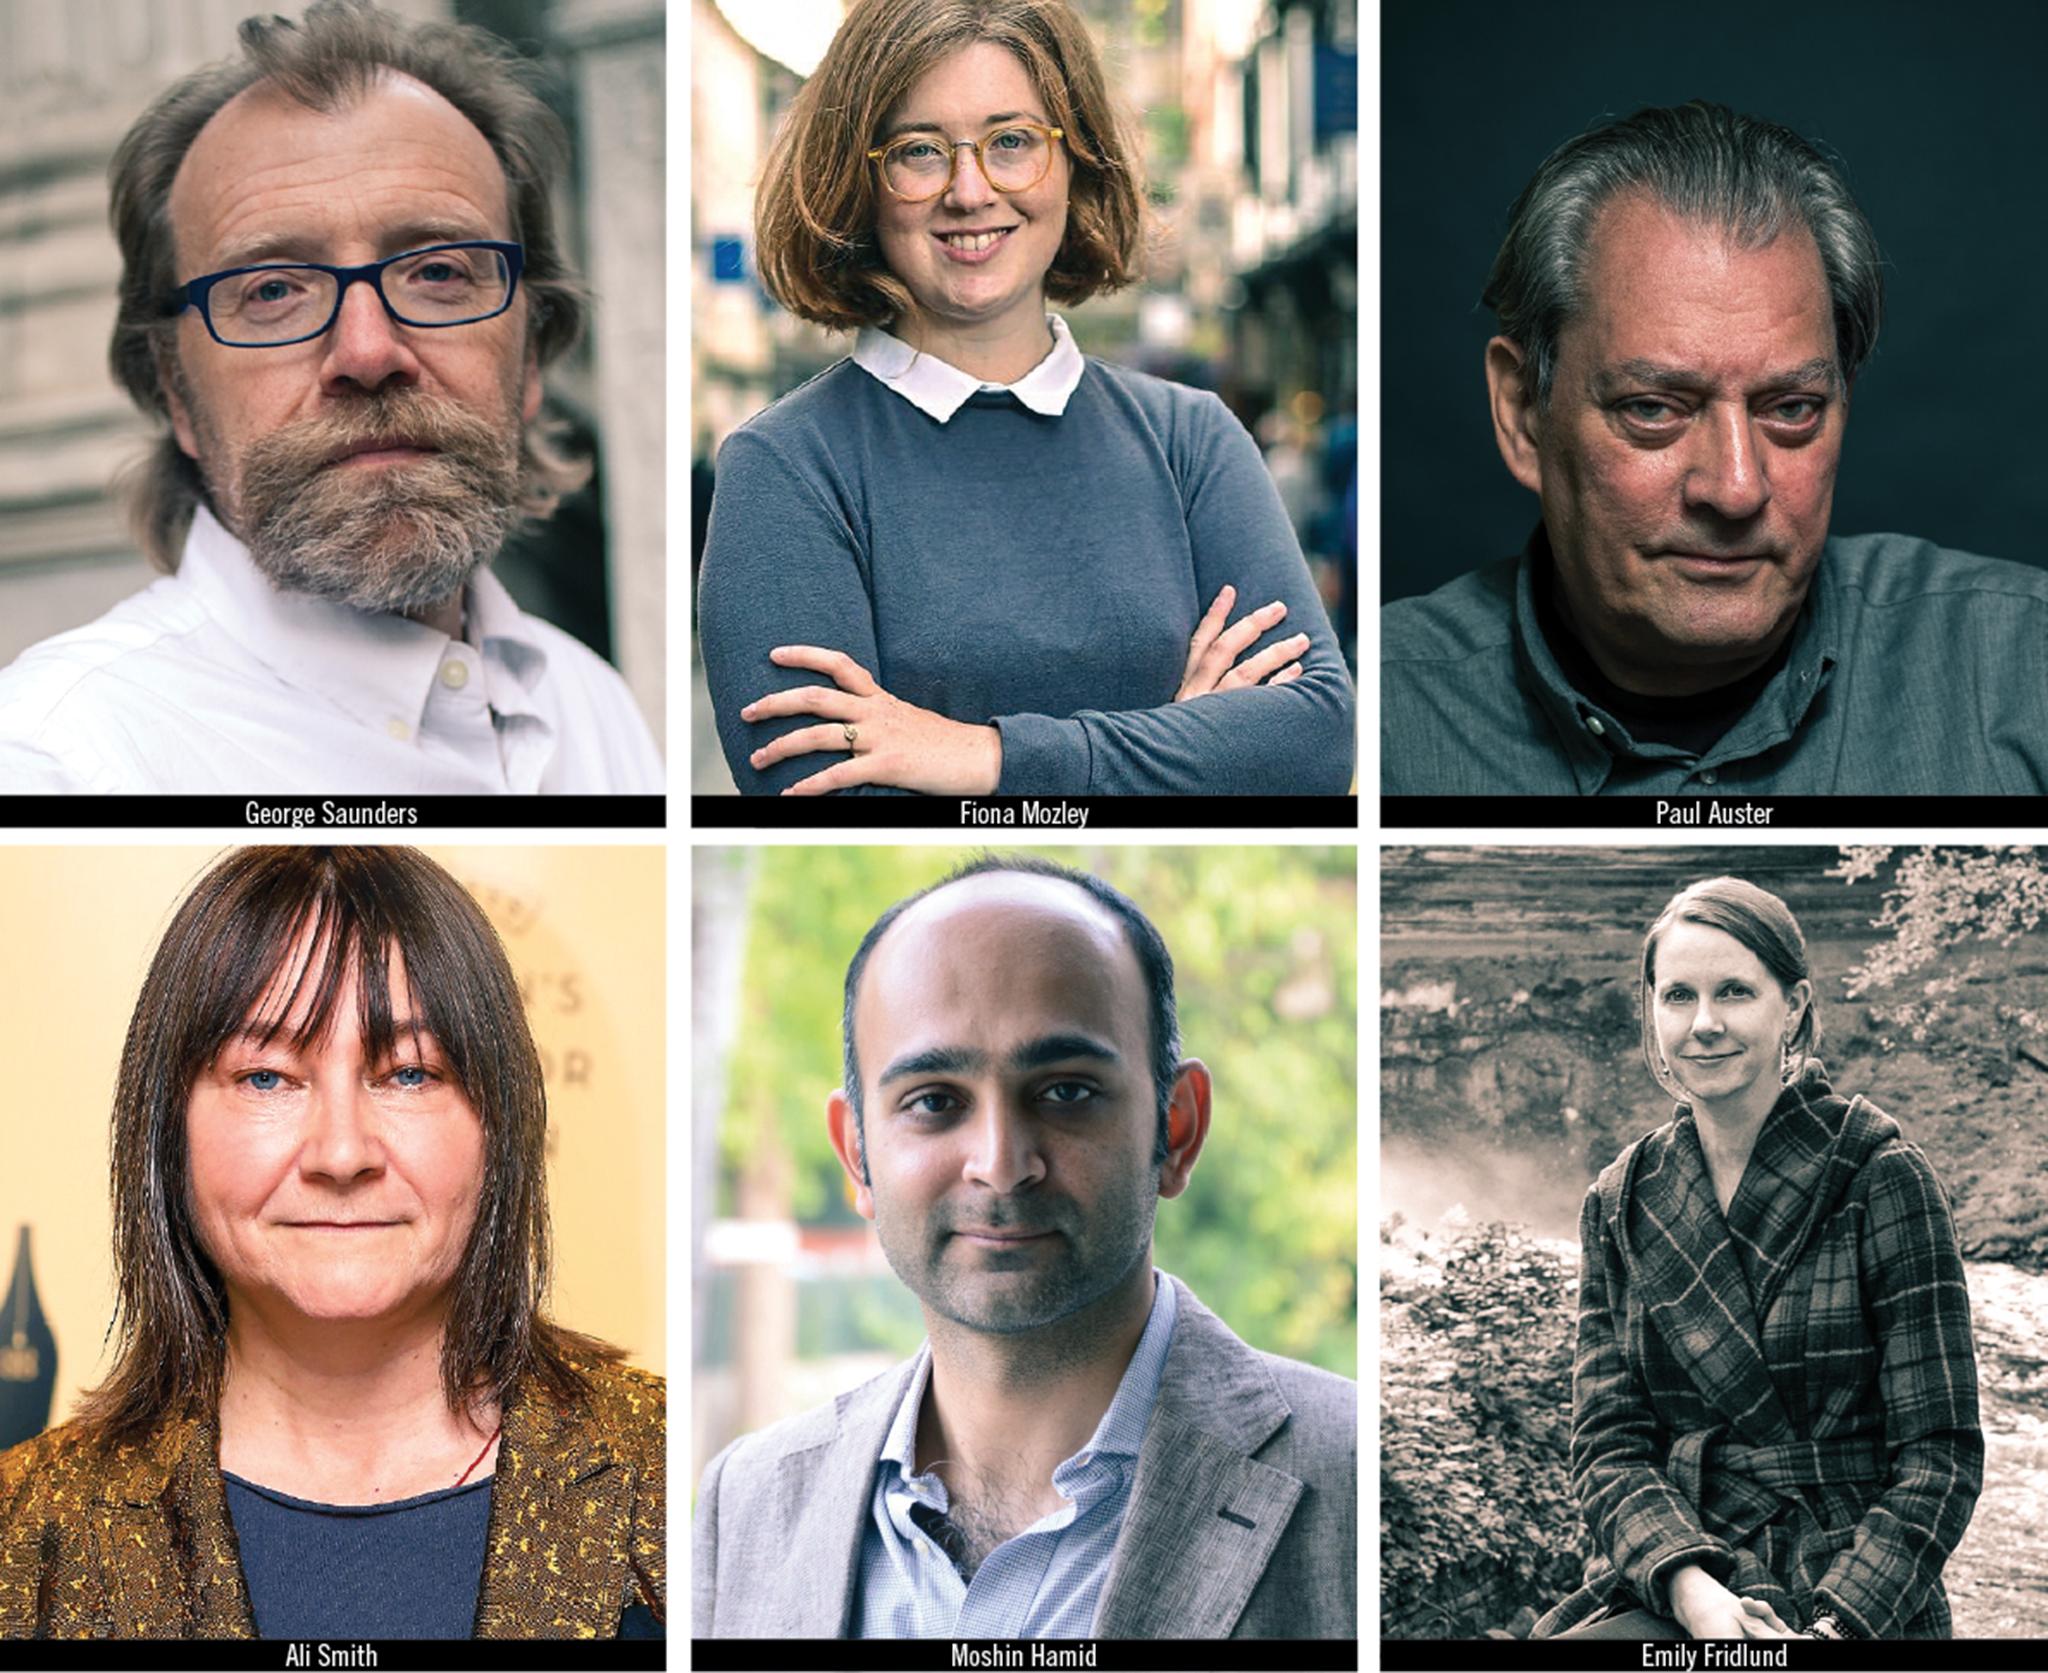 Man Booker Prize | Paul Auster, Ali Smith e George Saunders entre os finalistas